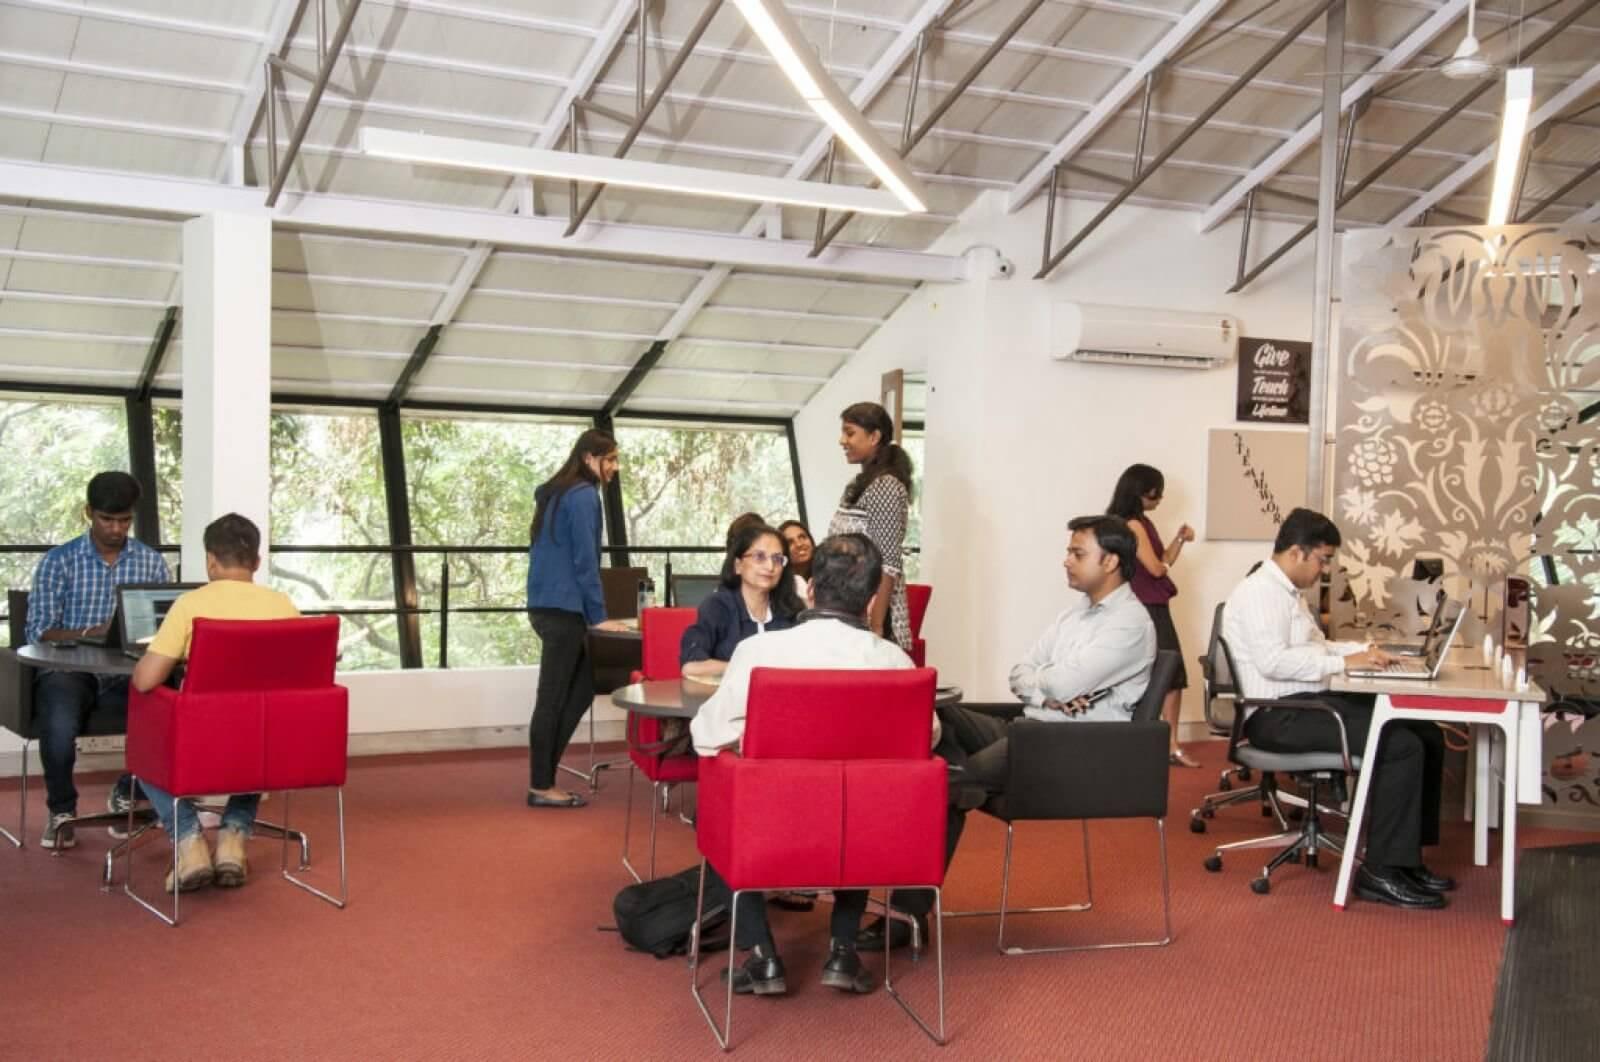 Evoma Coworking space